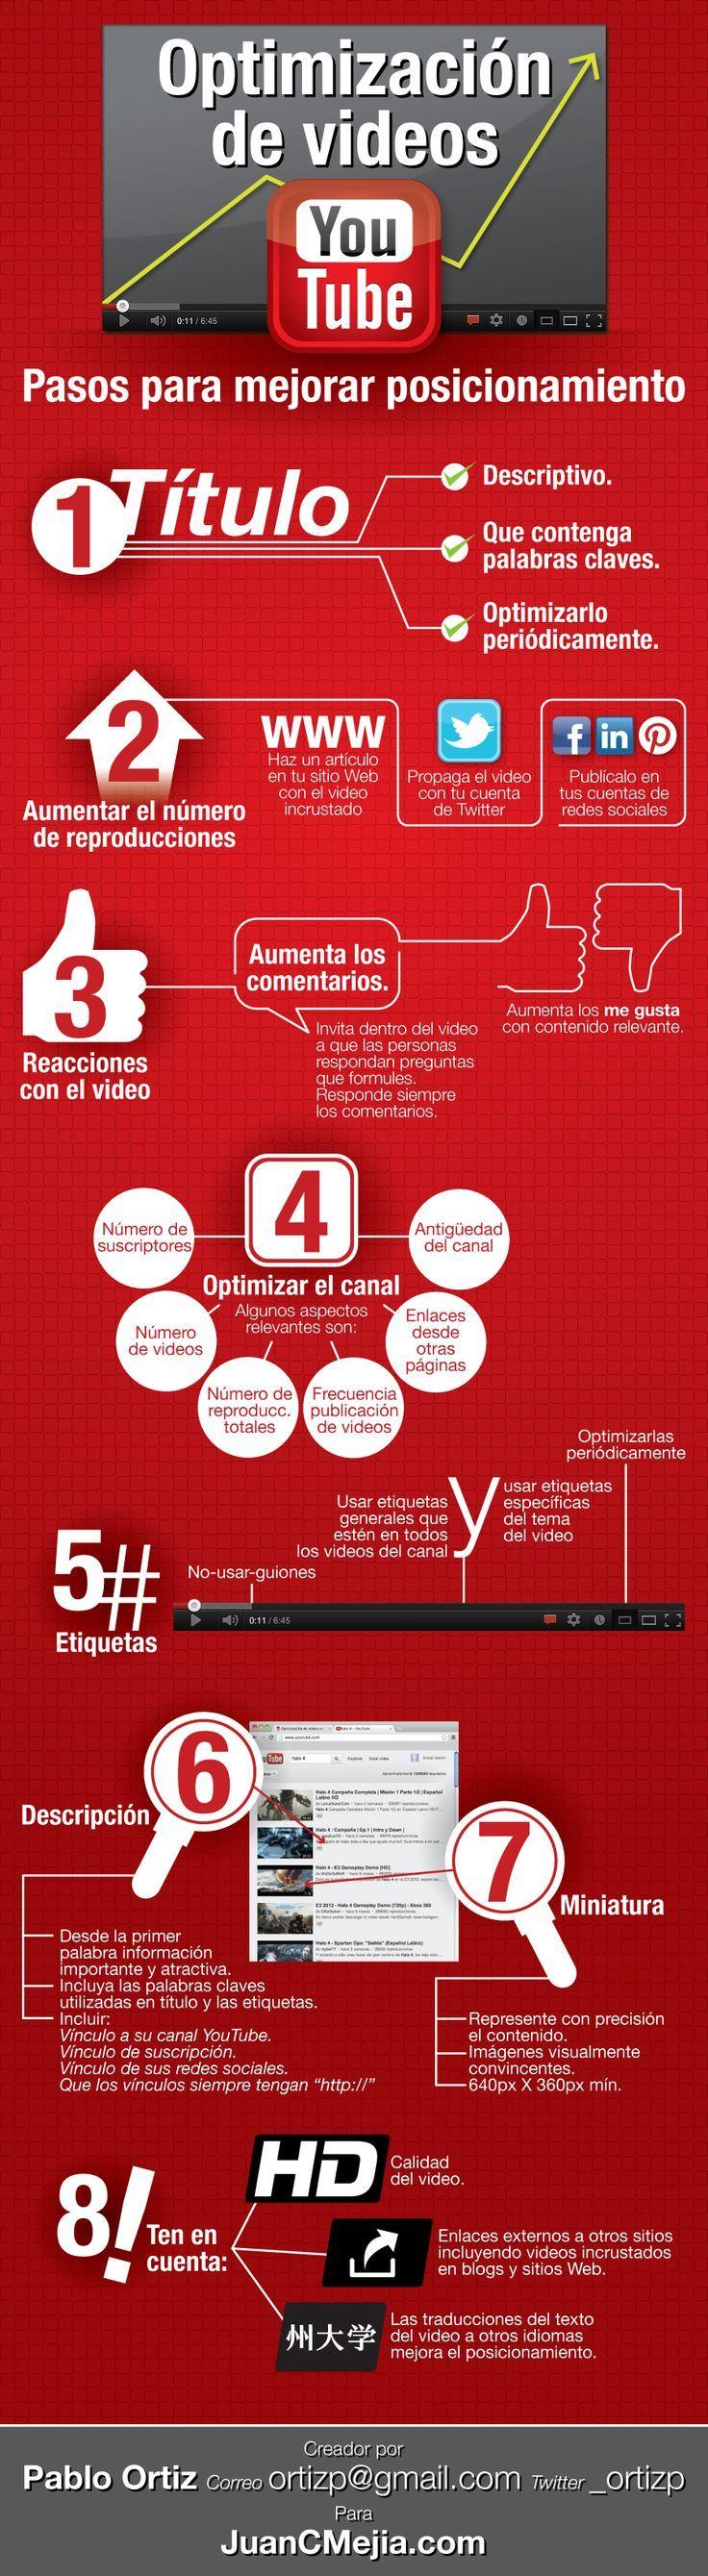 ¿Cómo optimizar videos en #Youtube? #Infografía